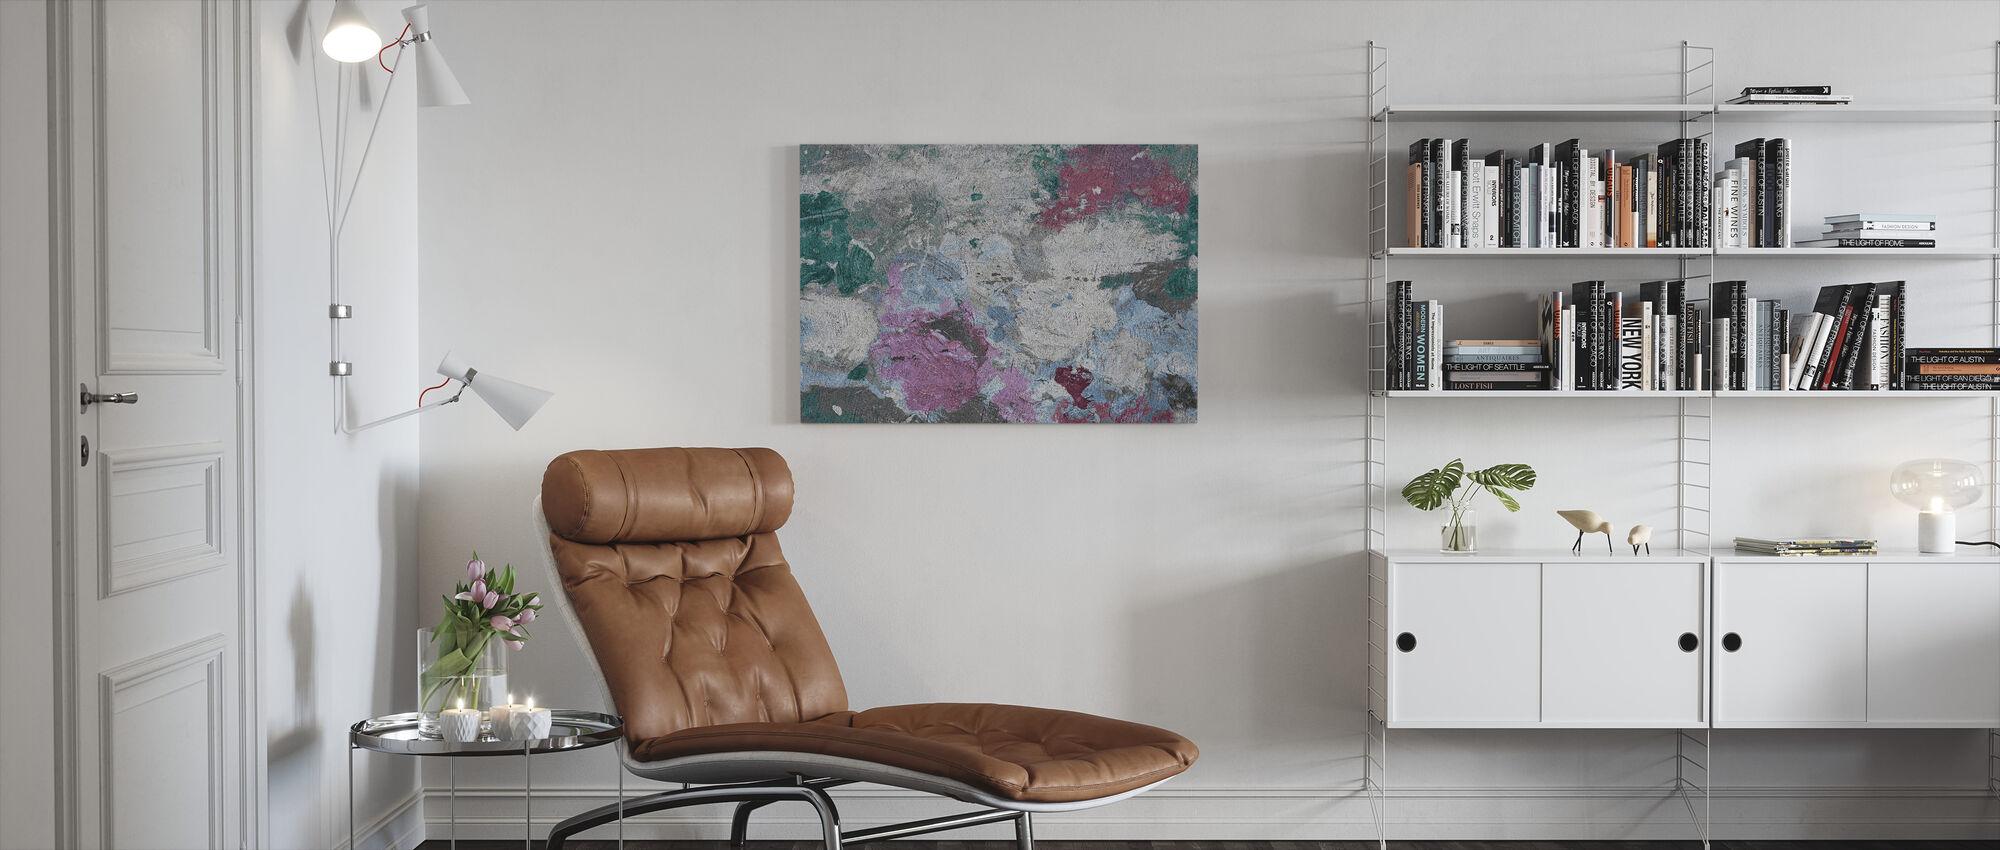 Oil Color Complexion - Plum - Canvas print - Living Room